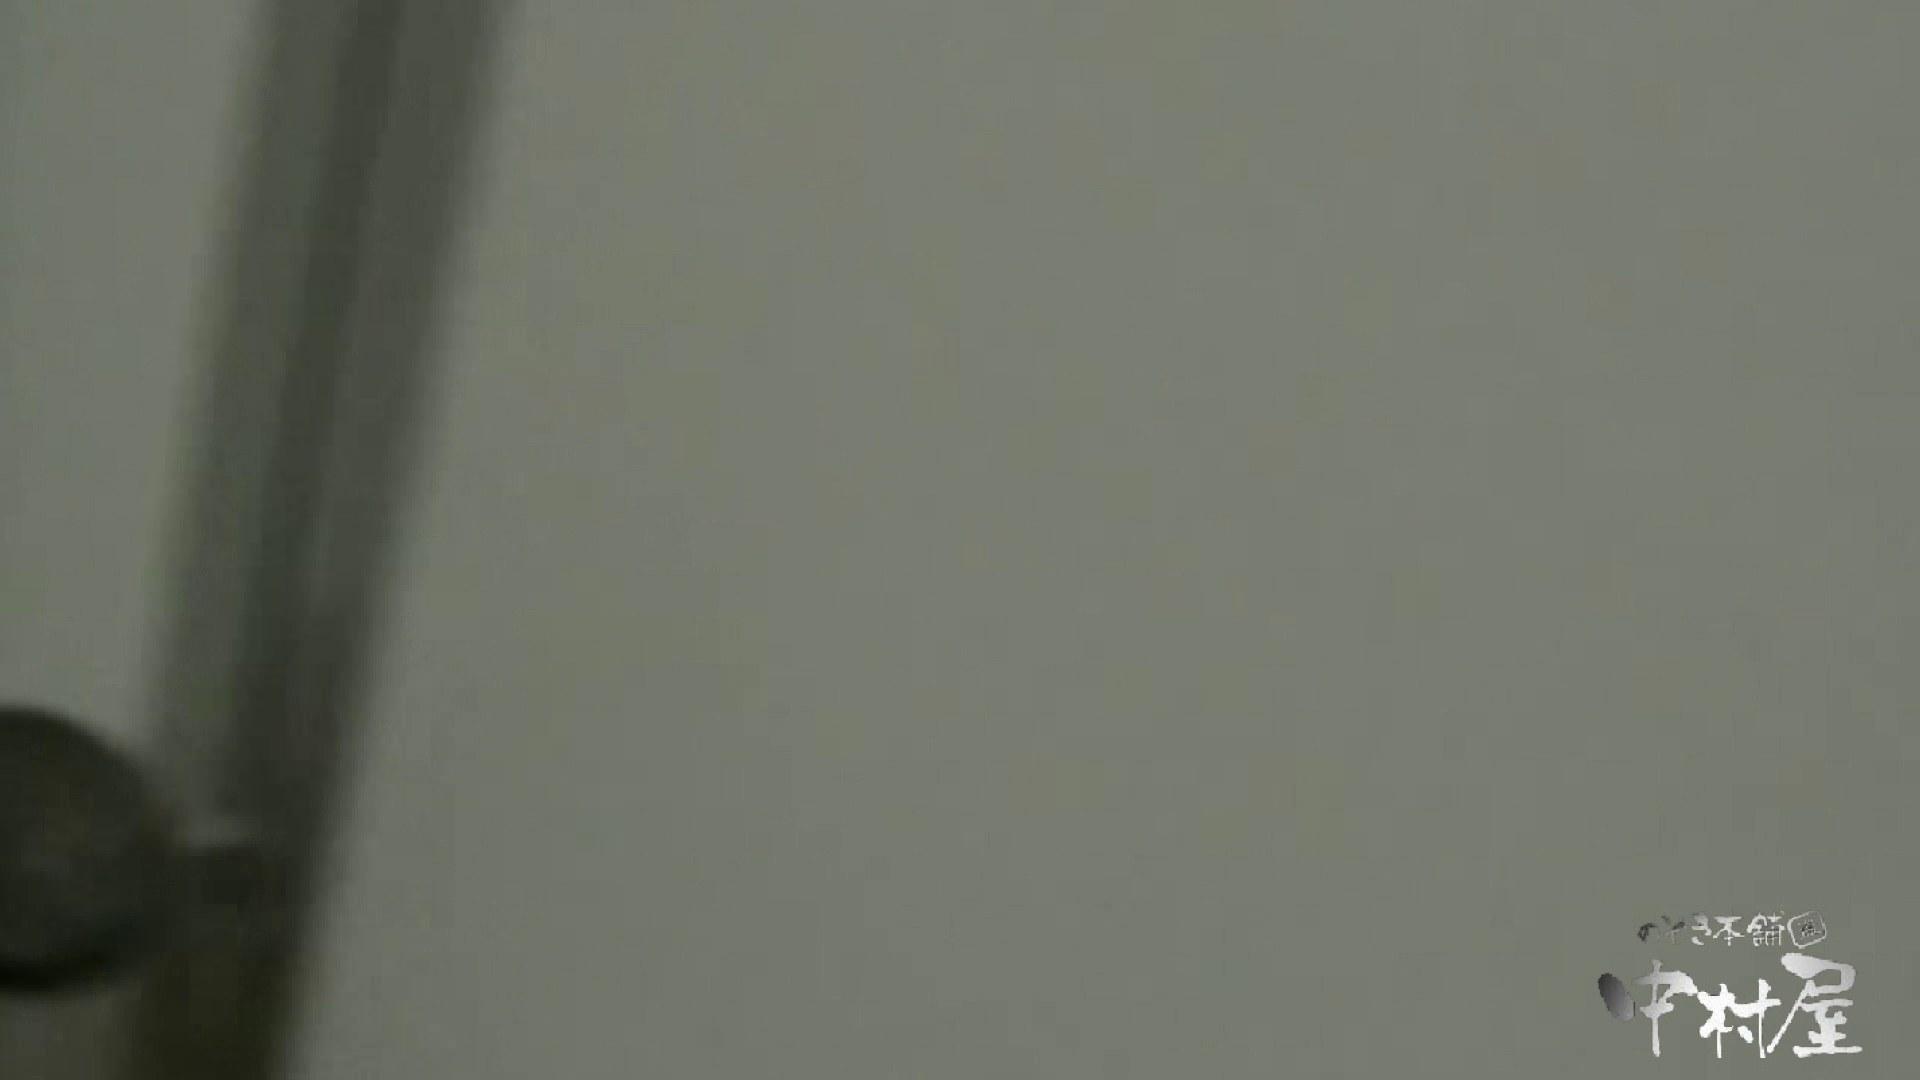 VIP配信している雅さんの独断と偏見で集めたVIP限定 動画集Vol.1一部公開 期間限定  102PIX 40